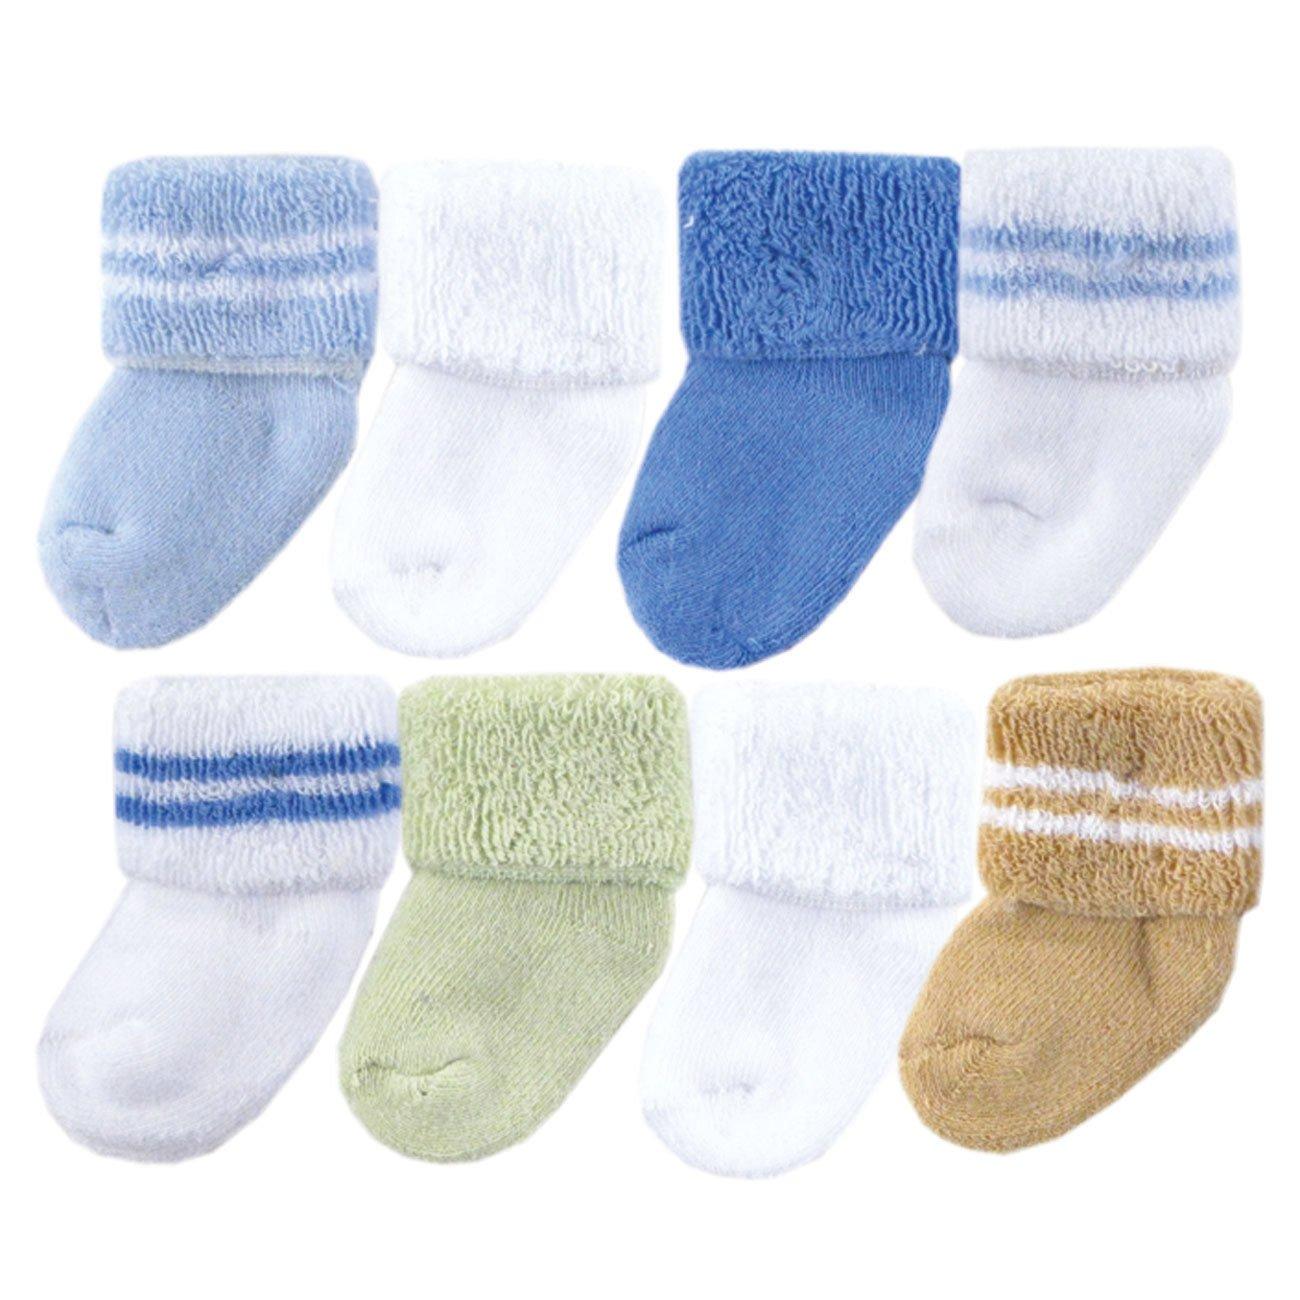 Luvable Friends Unisex Baby Socks, Blue